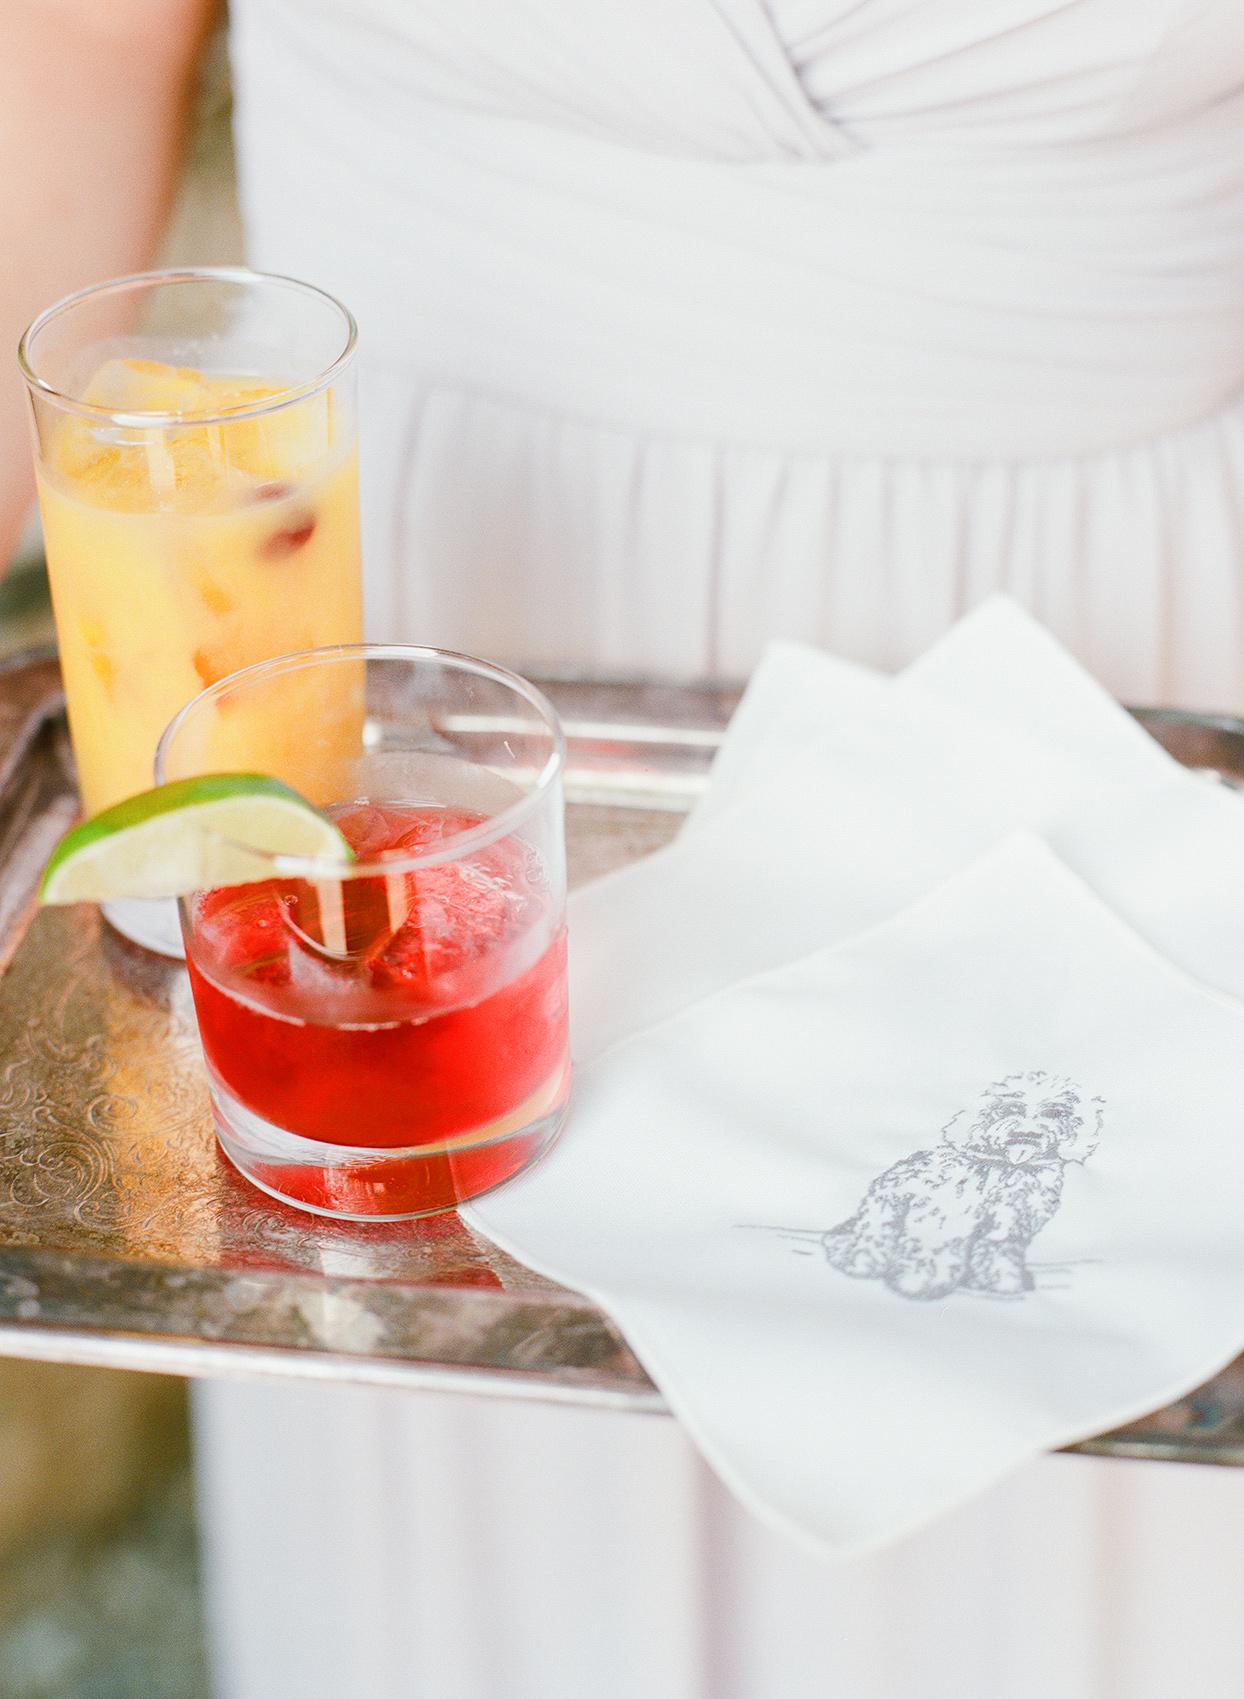 shelby david wedding cocktails on tray with dog napkin